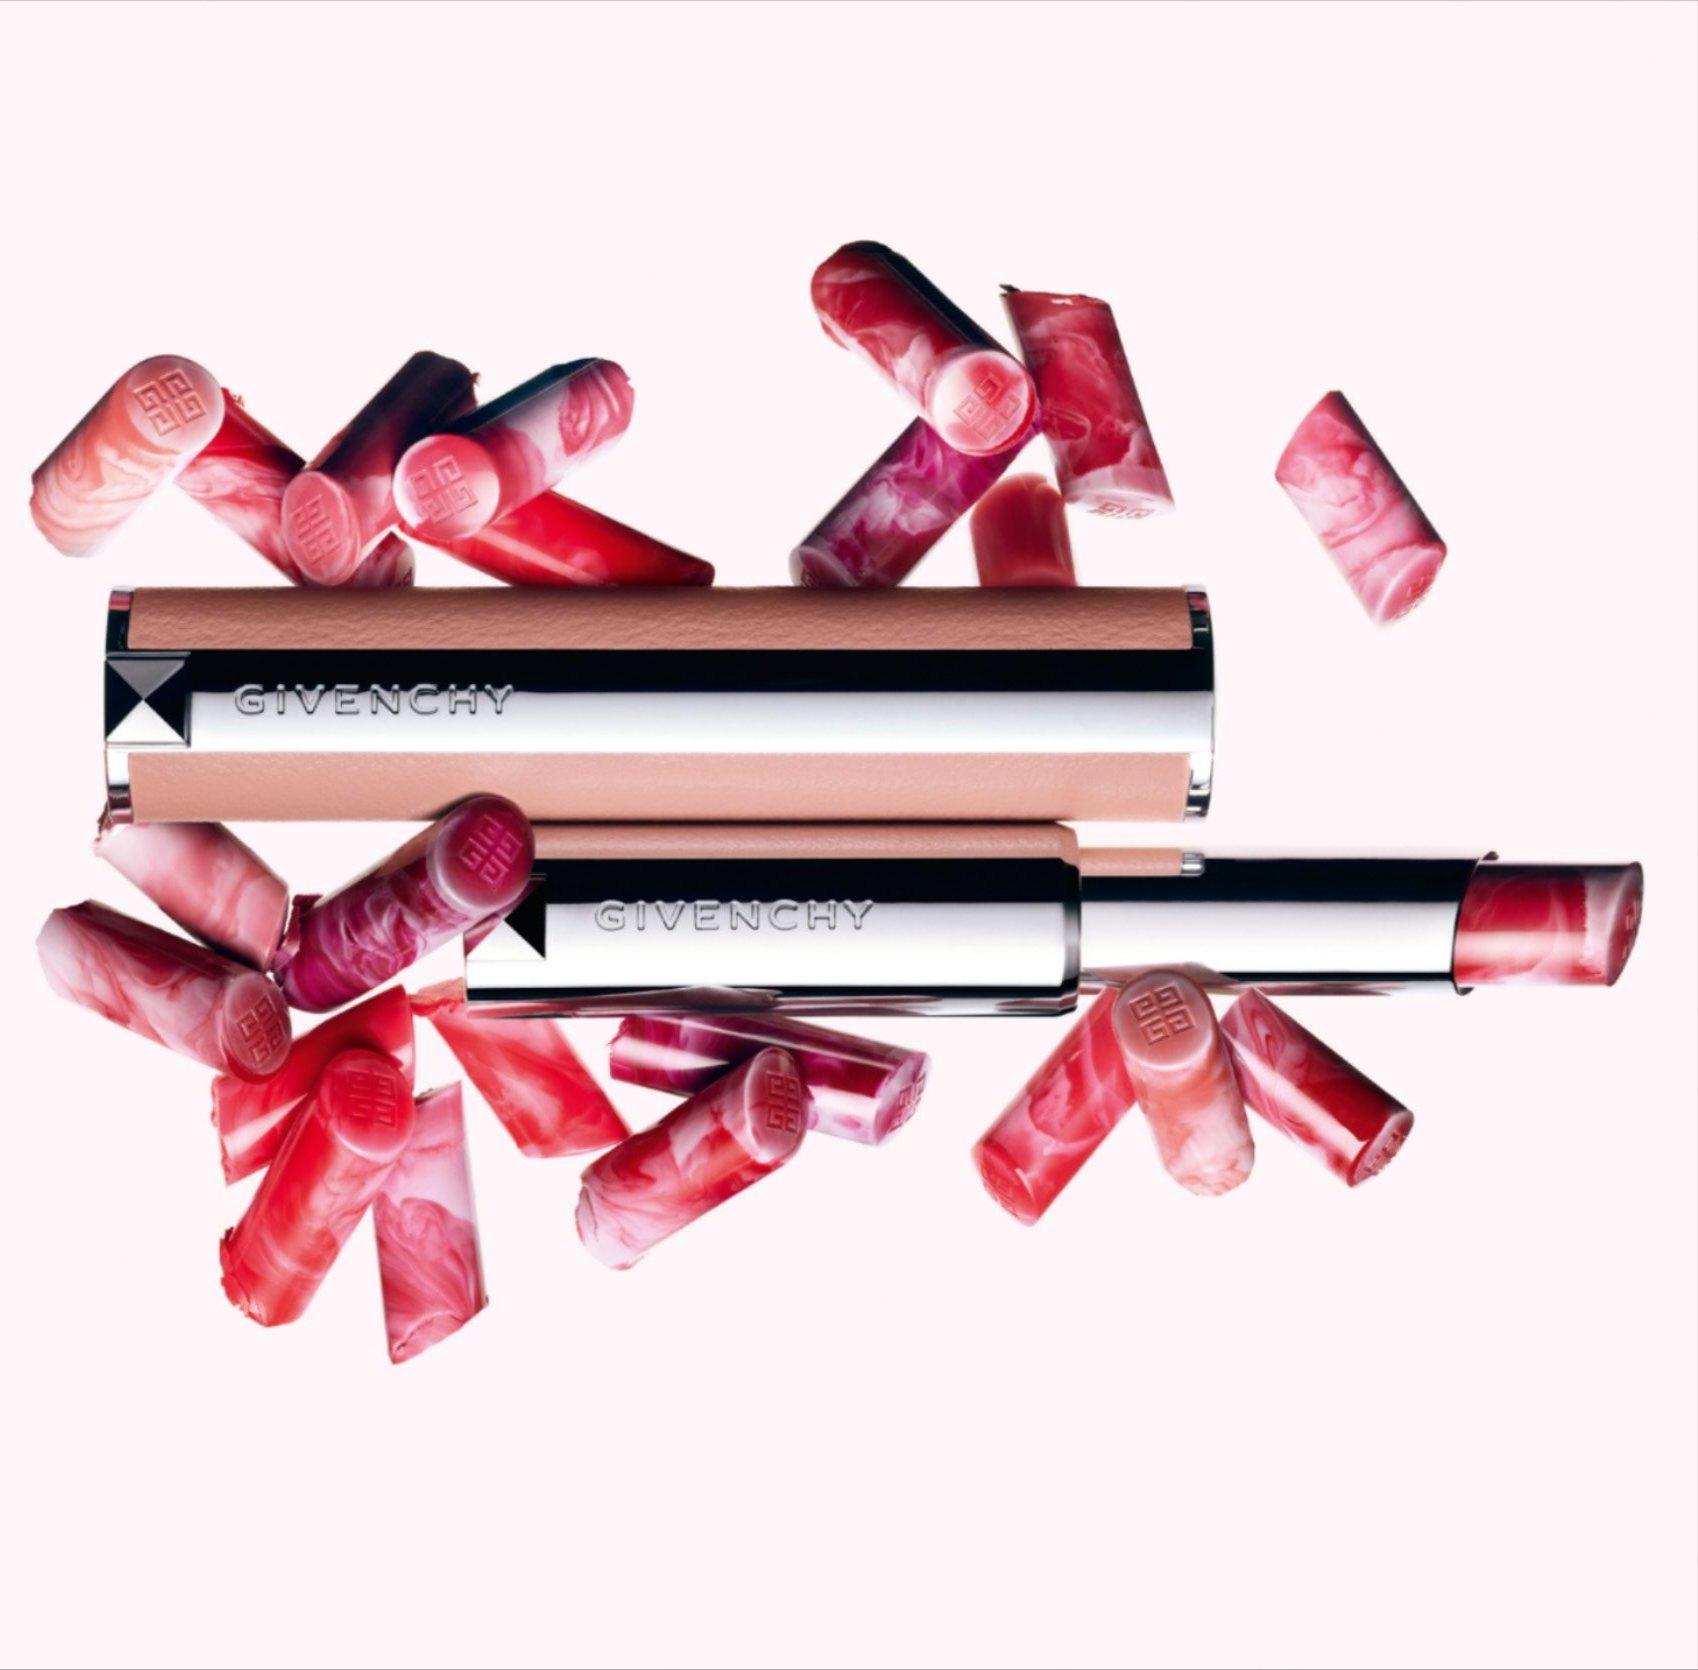 Nuevo objeto de deseo: Givenchy Rose Perfecto